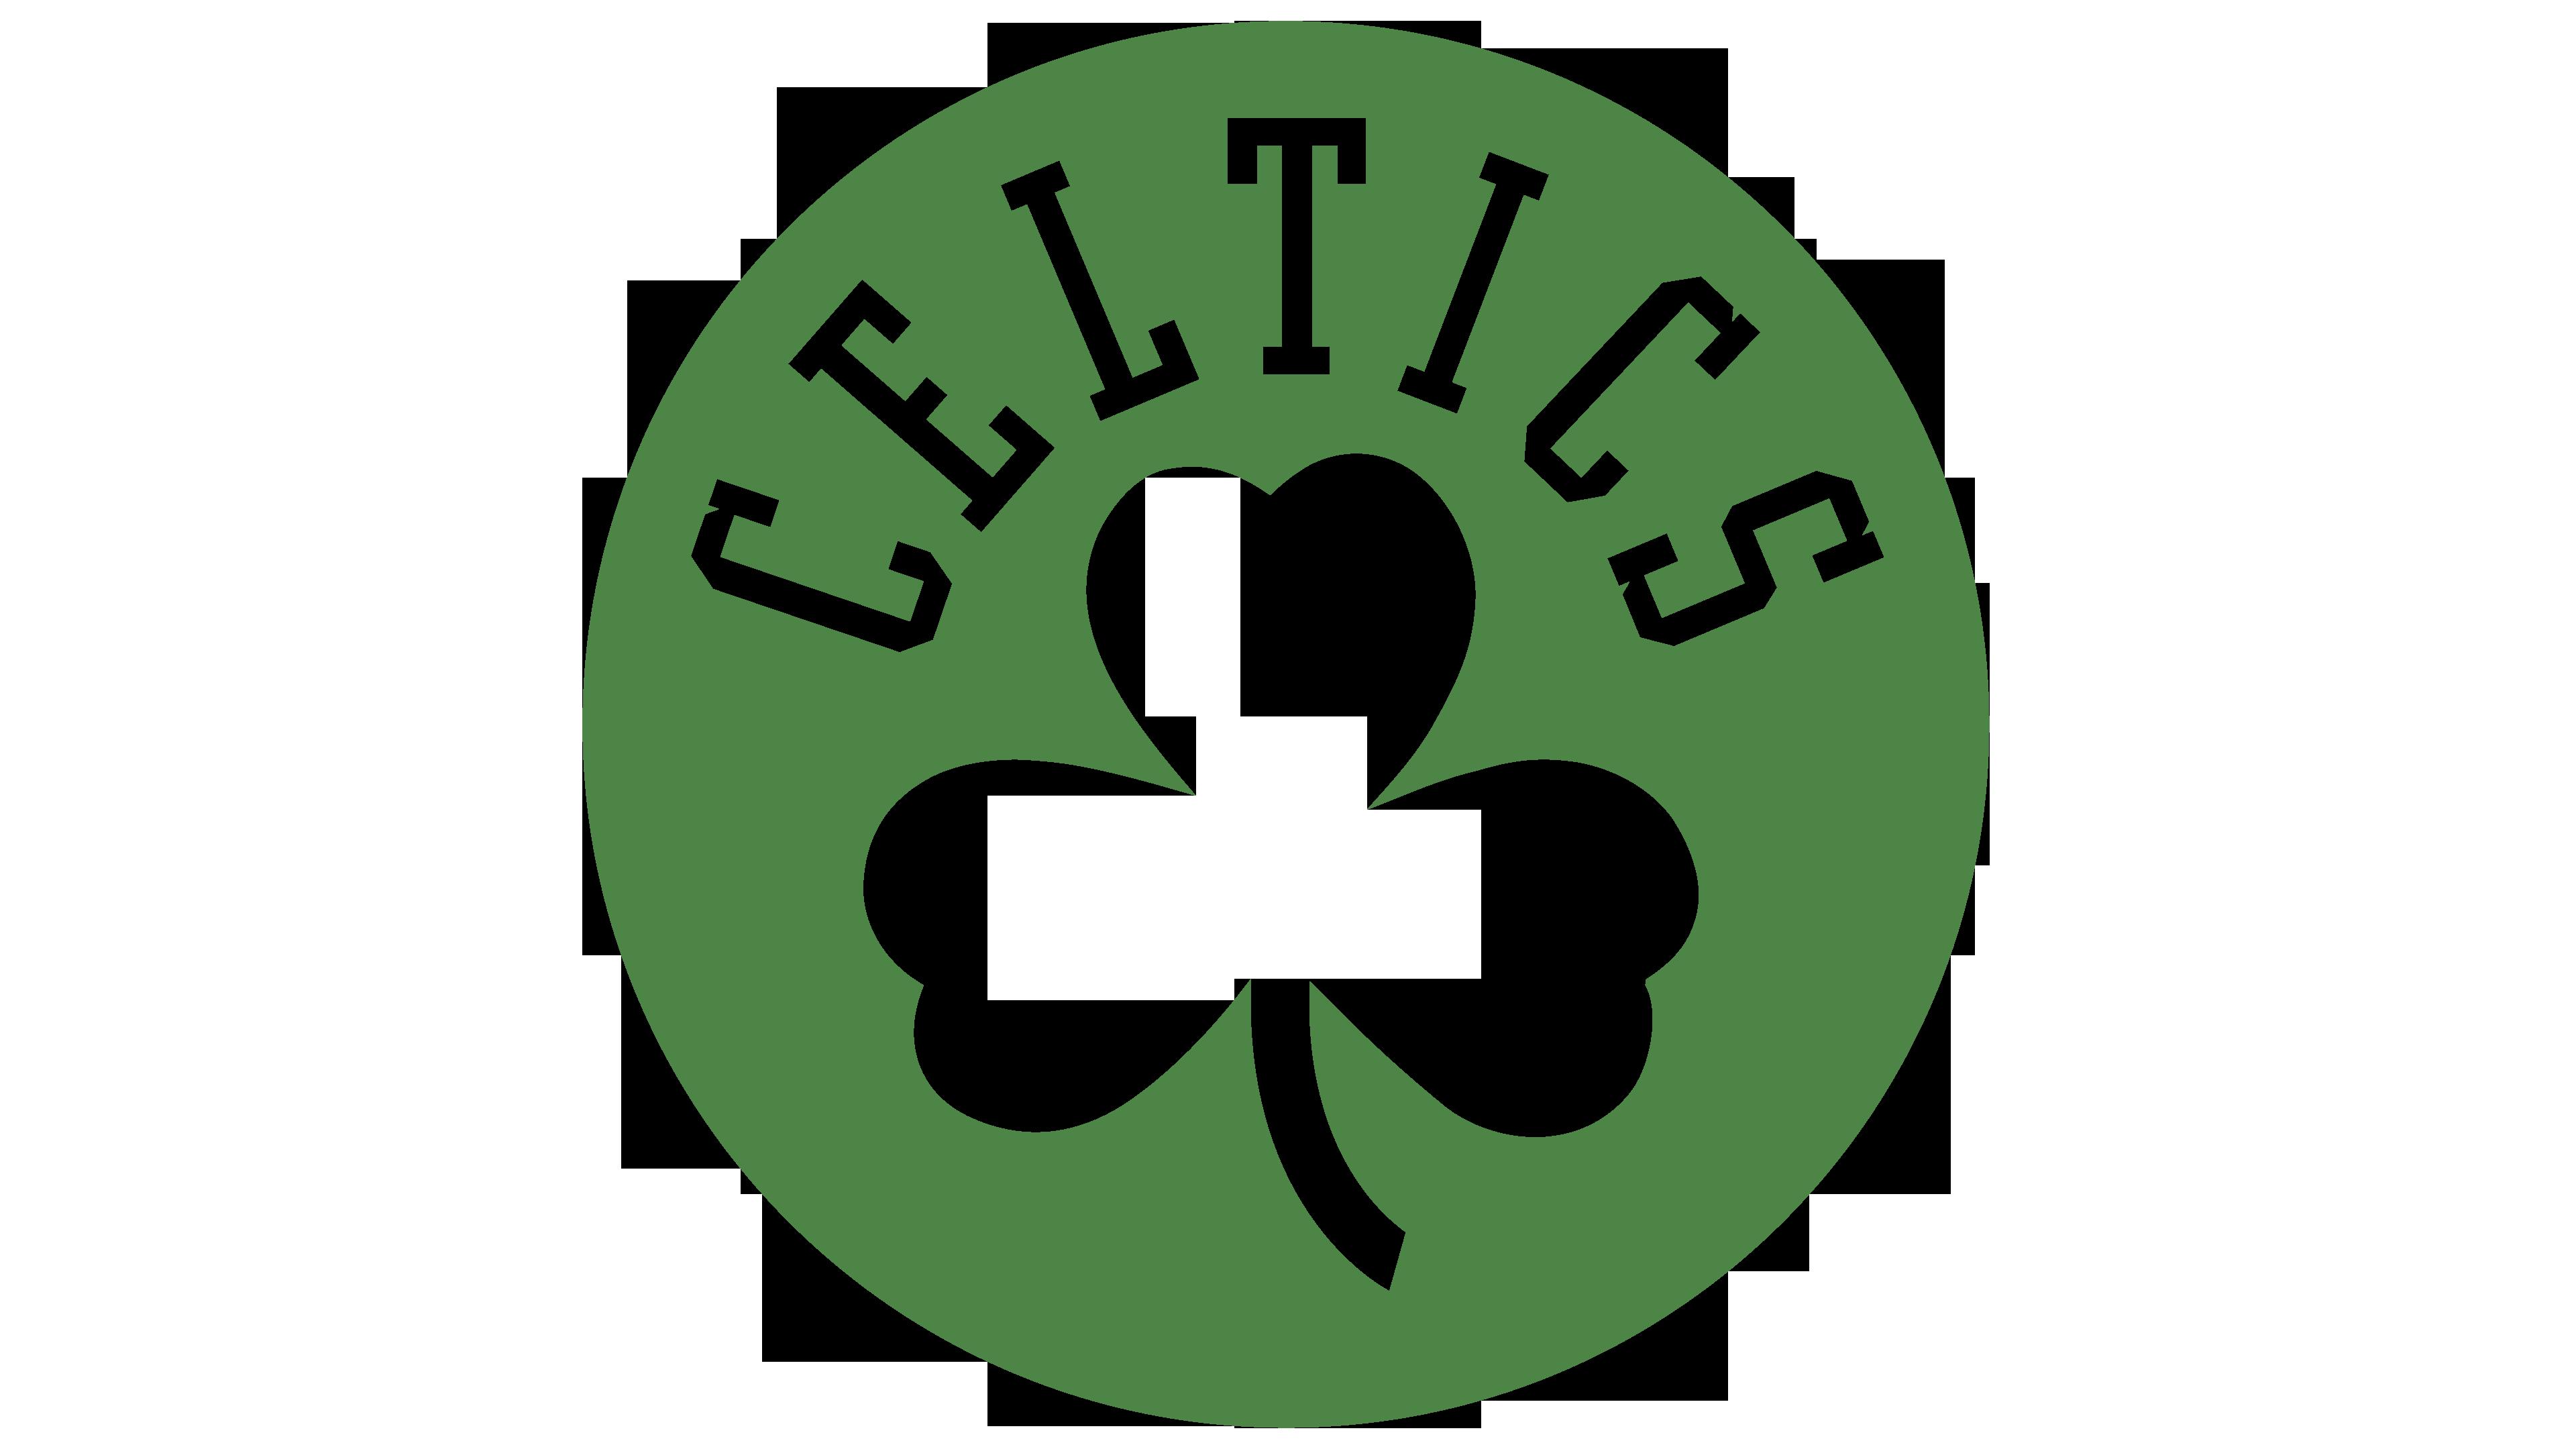 Logo interesting history of. Leprechaun clipart boston celtics